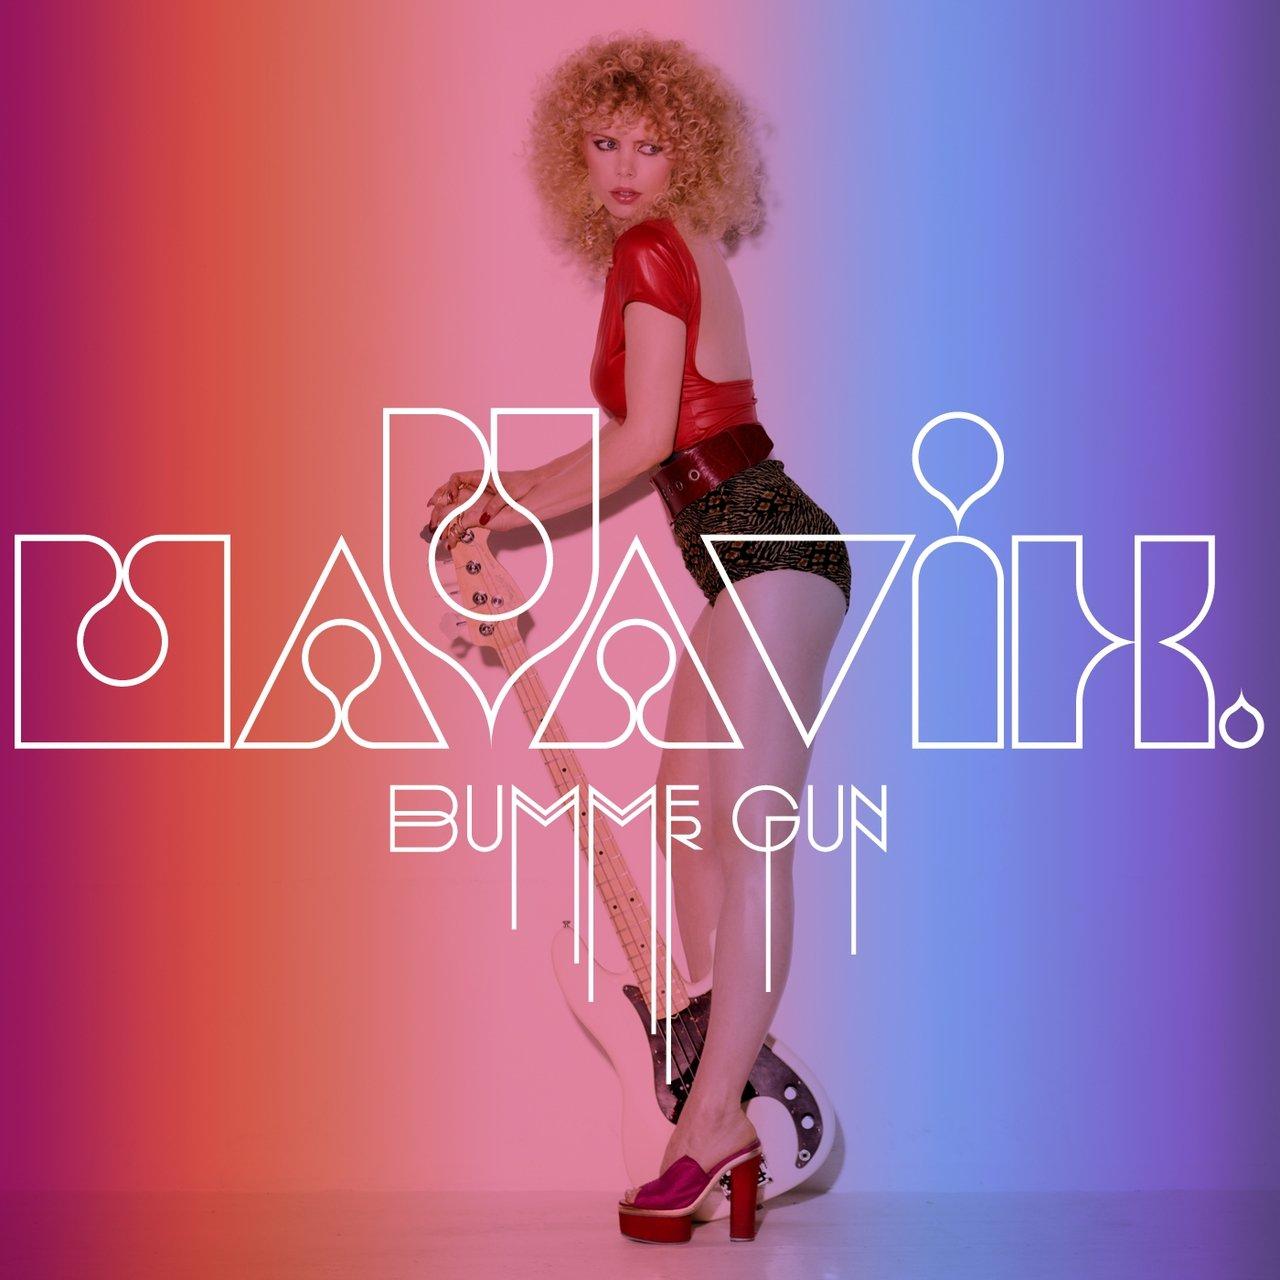 Maya Vik - Bummer Gun [LP]